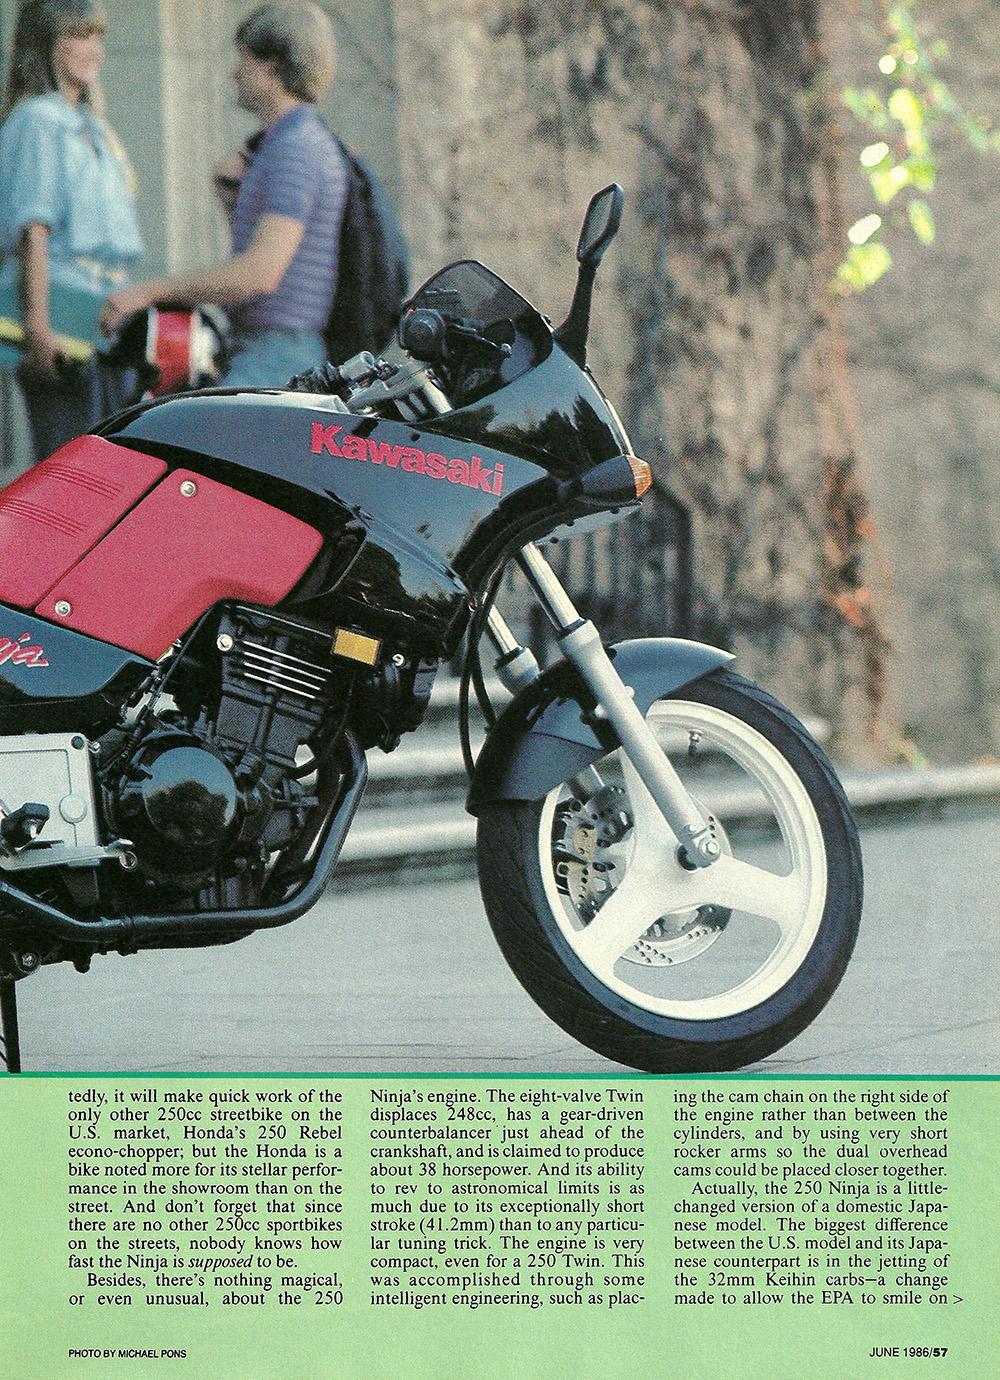 1986 Kawasaki Ninja 250 road test 02.jpg